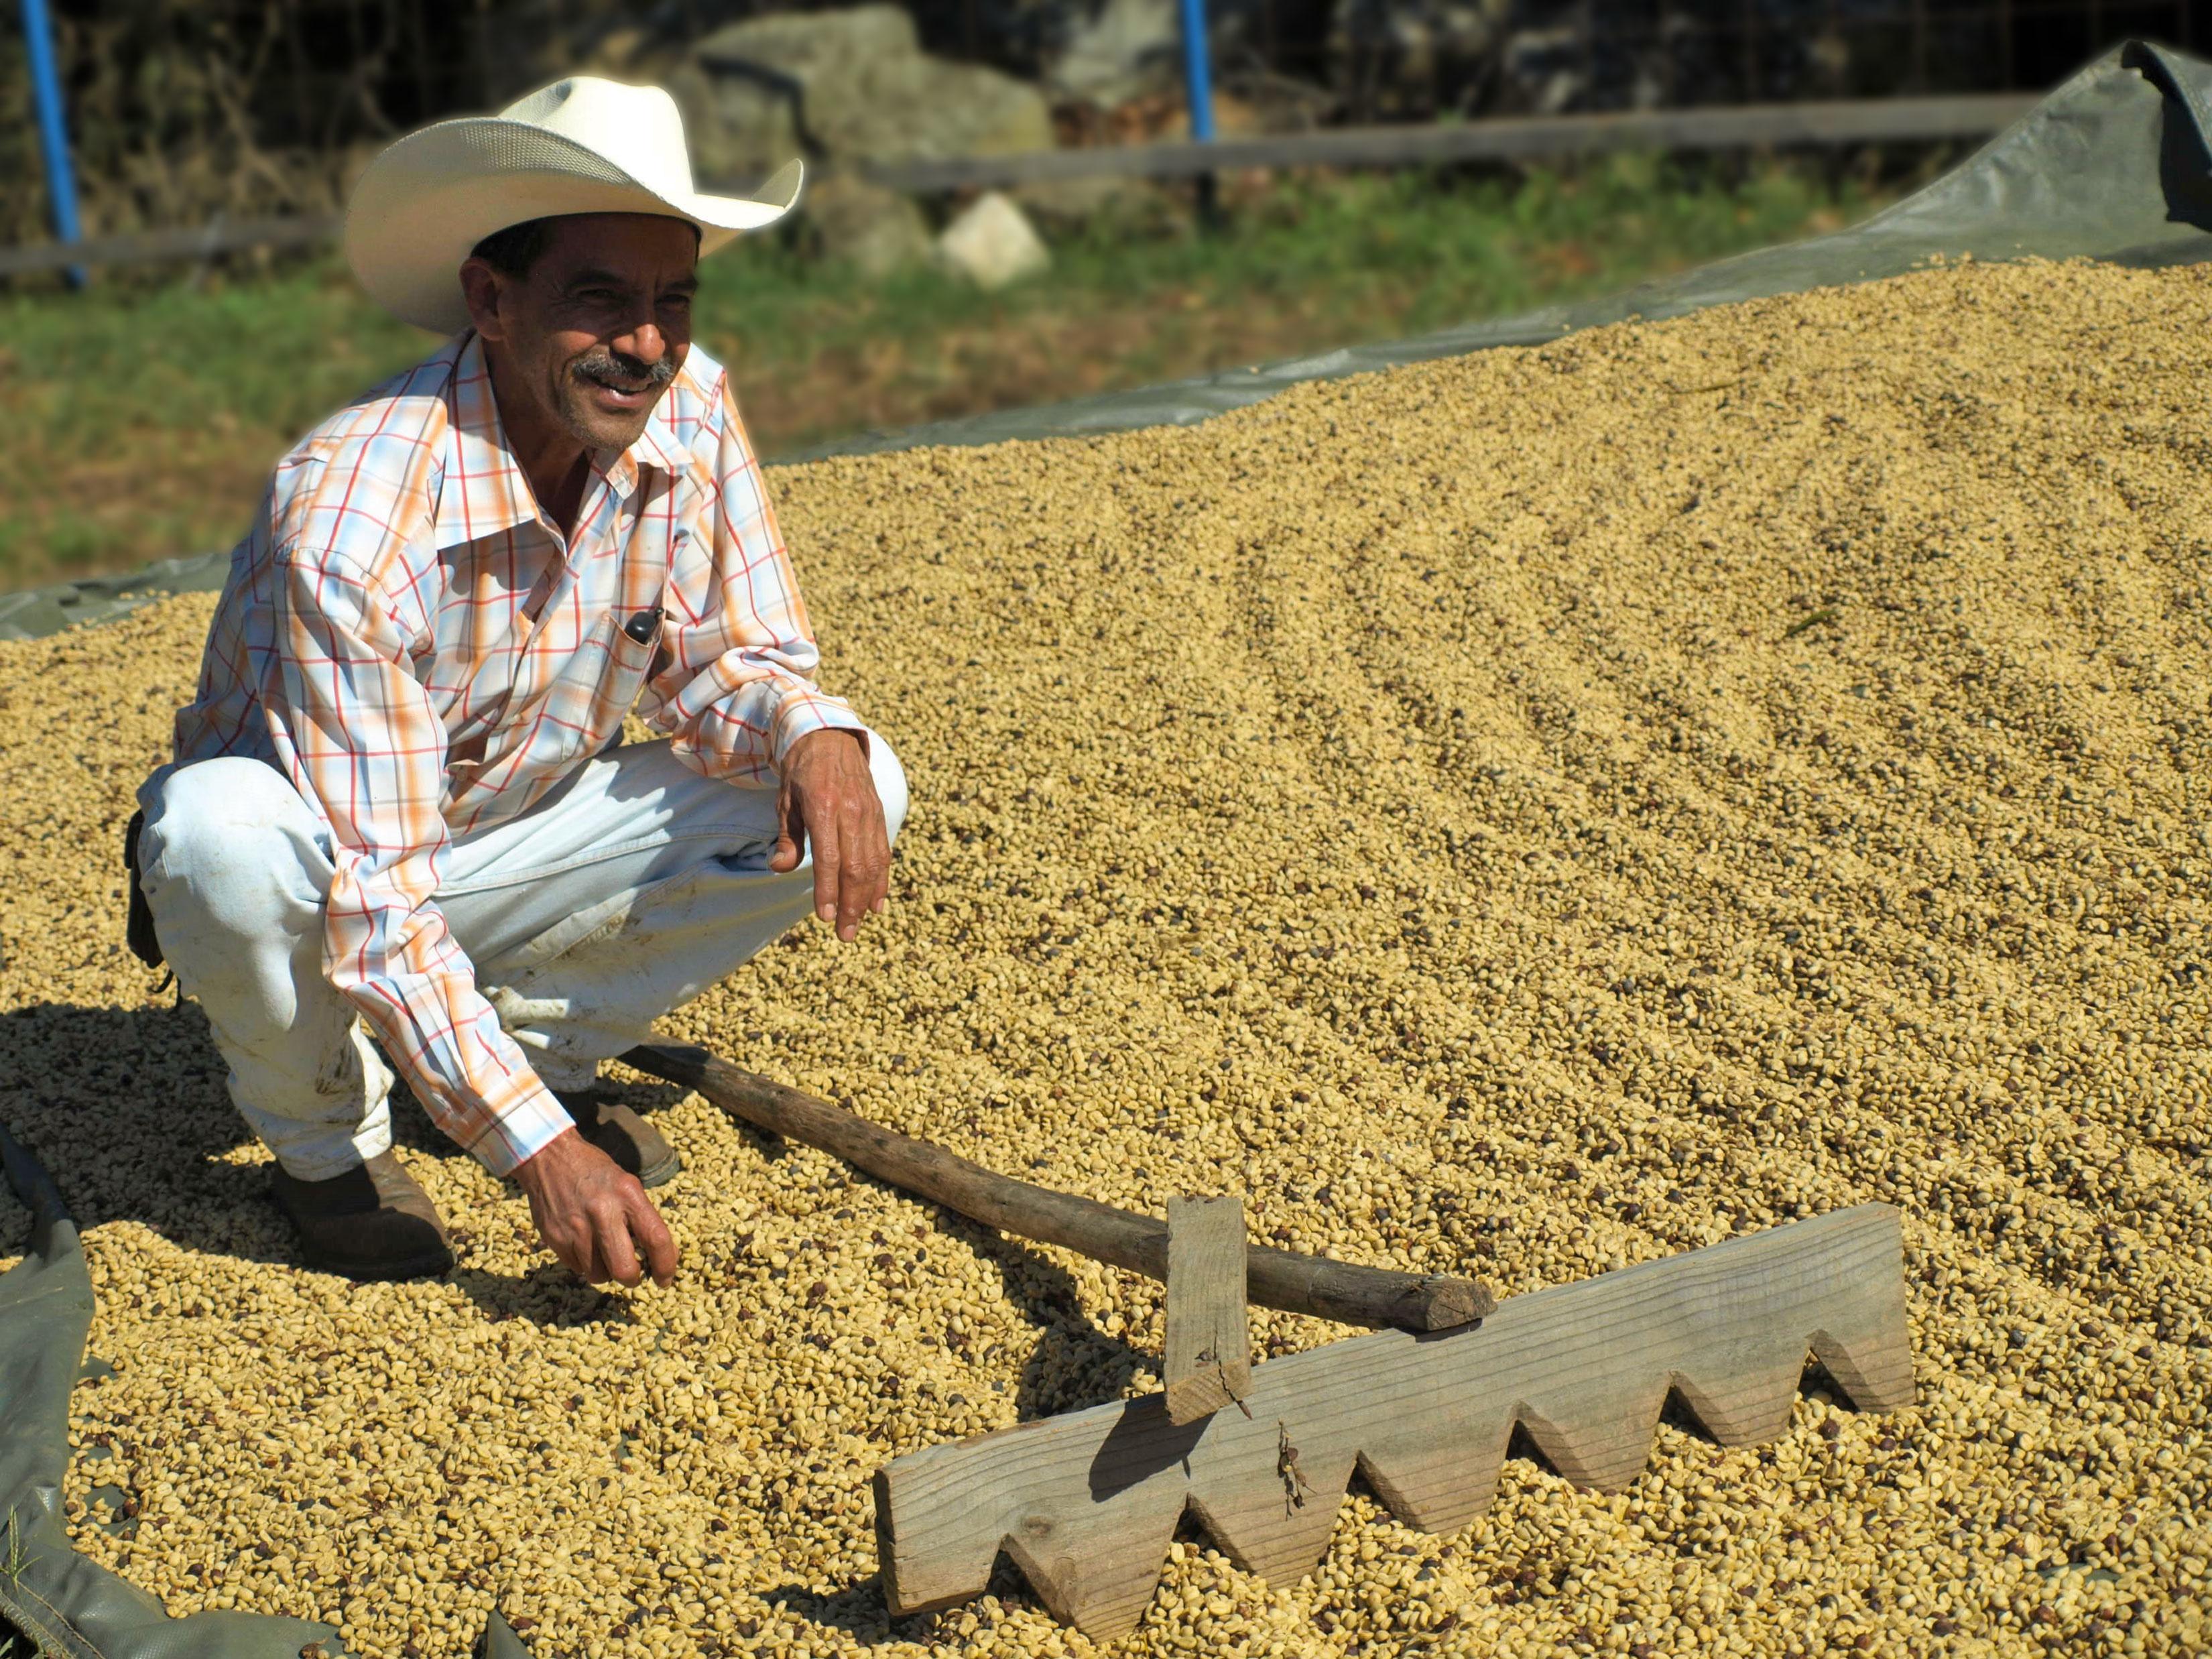 rastelo - грабли для сушки кофе